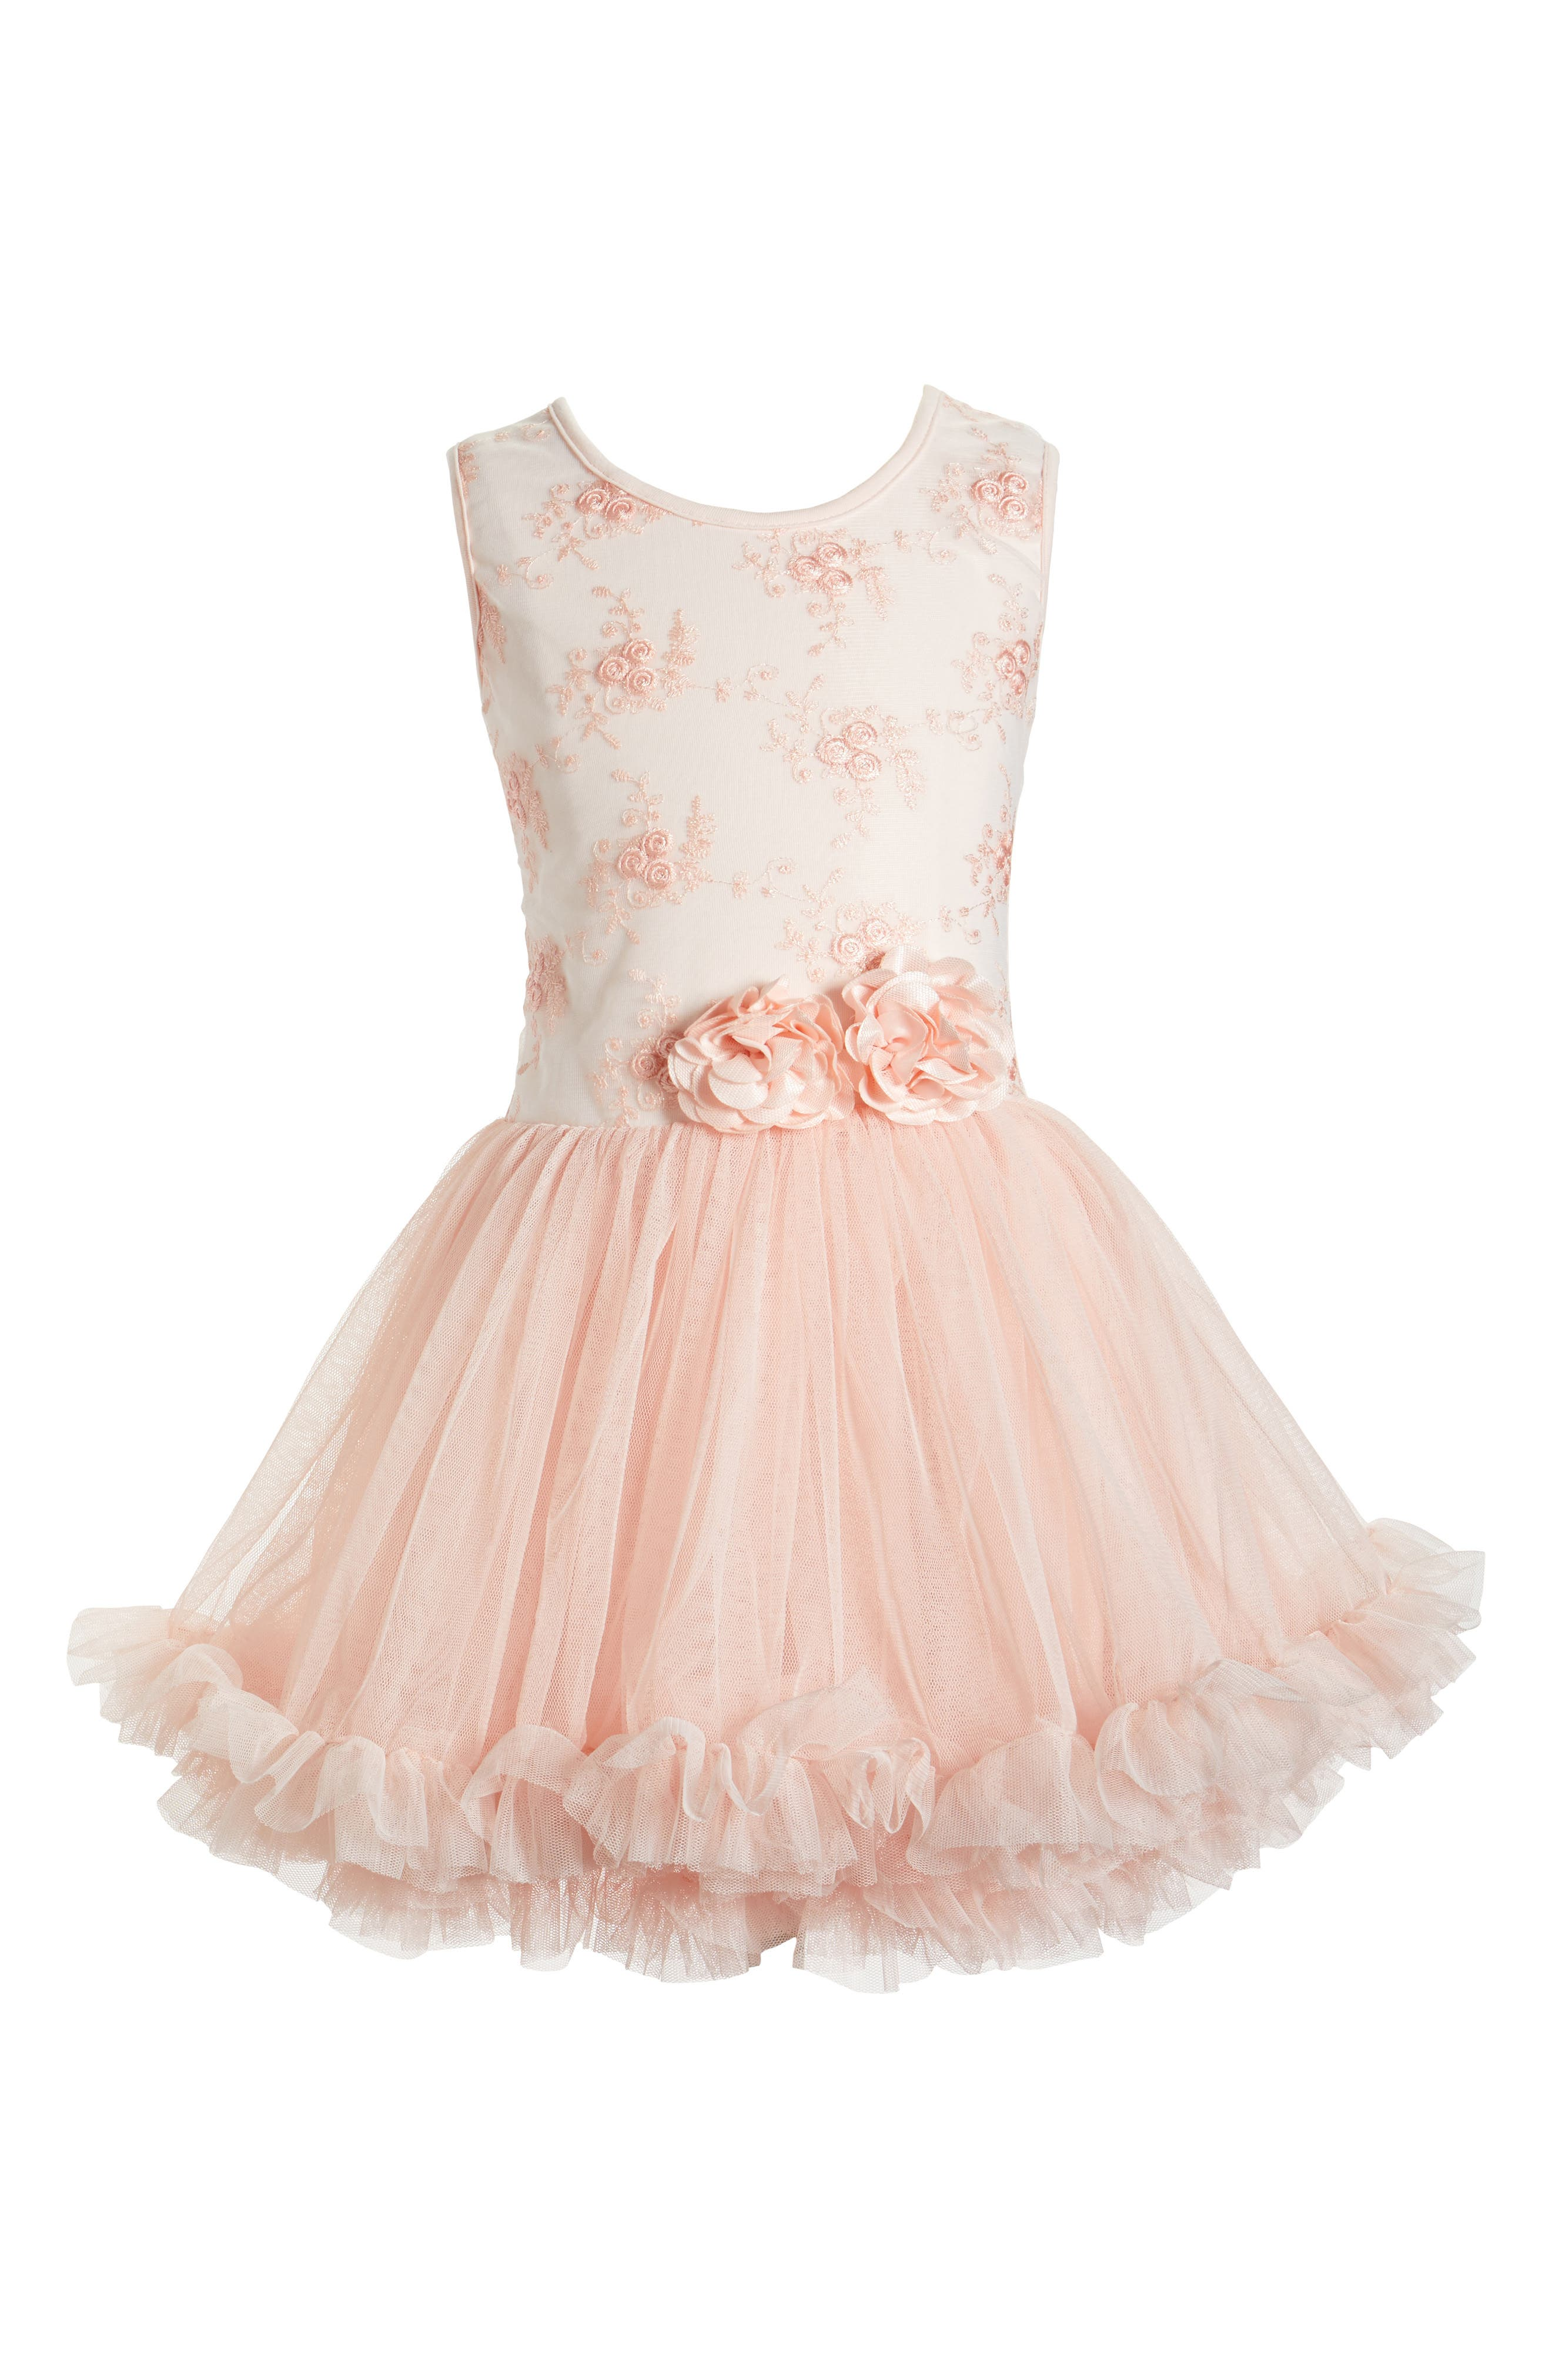 Main Image - Popatu Sleeveless Floral Dress (Toddler Girls & Little Girls)